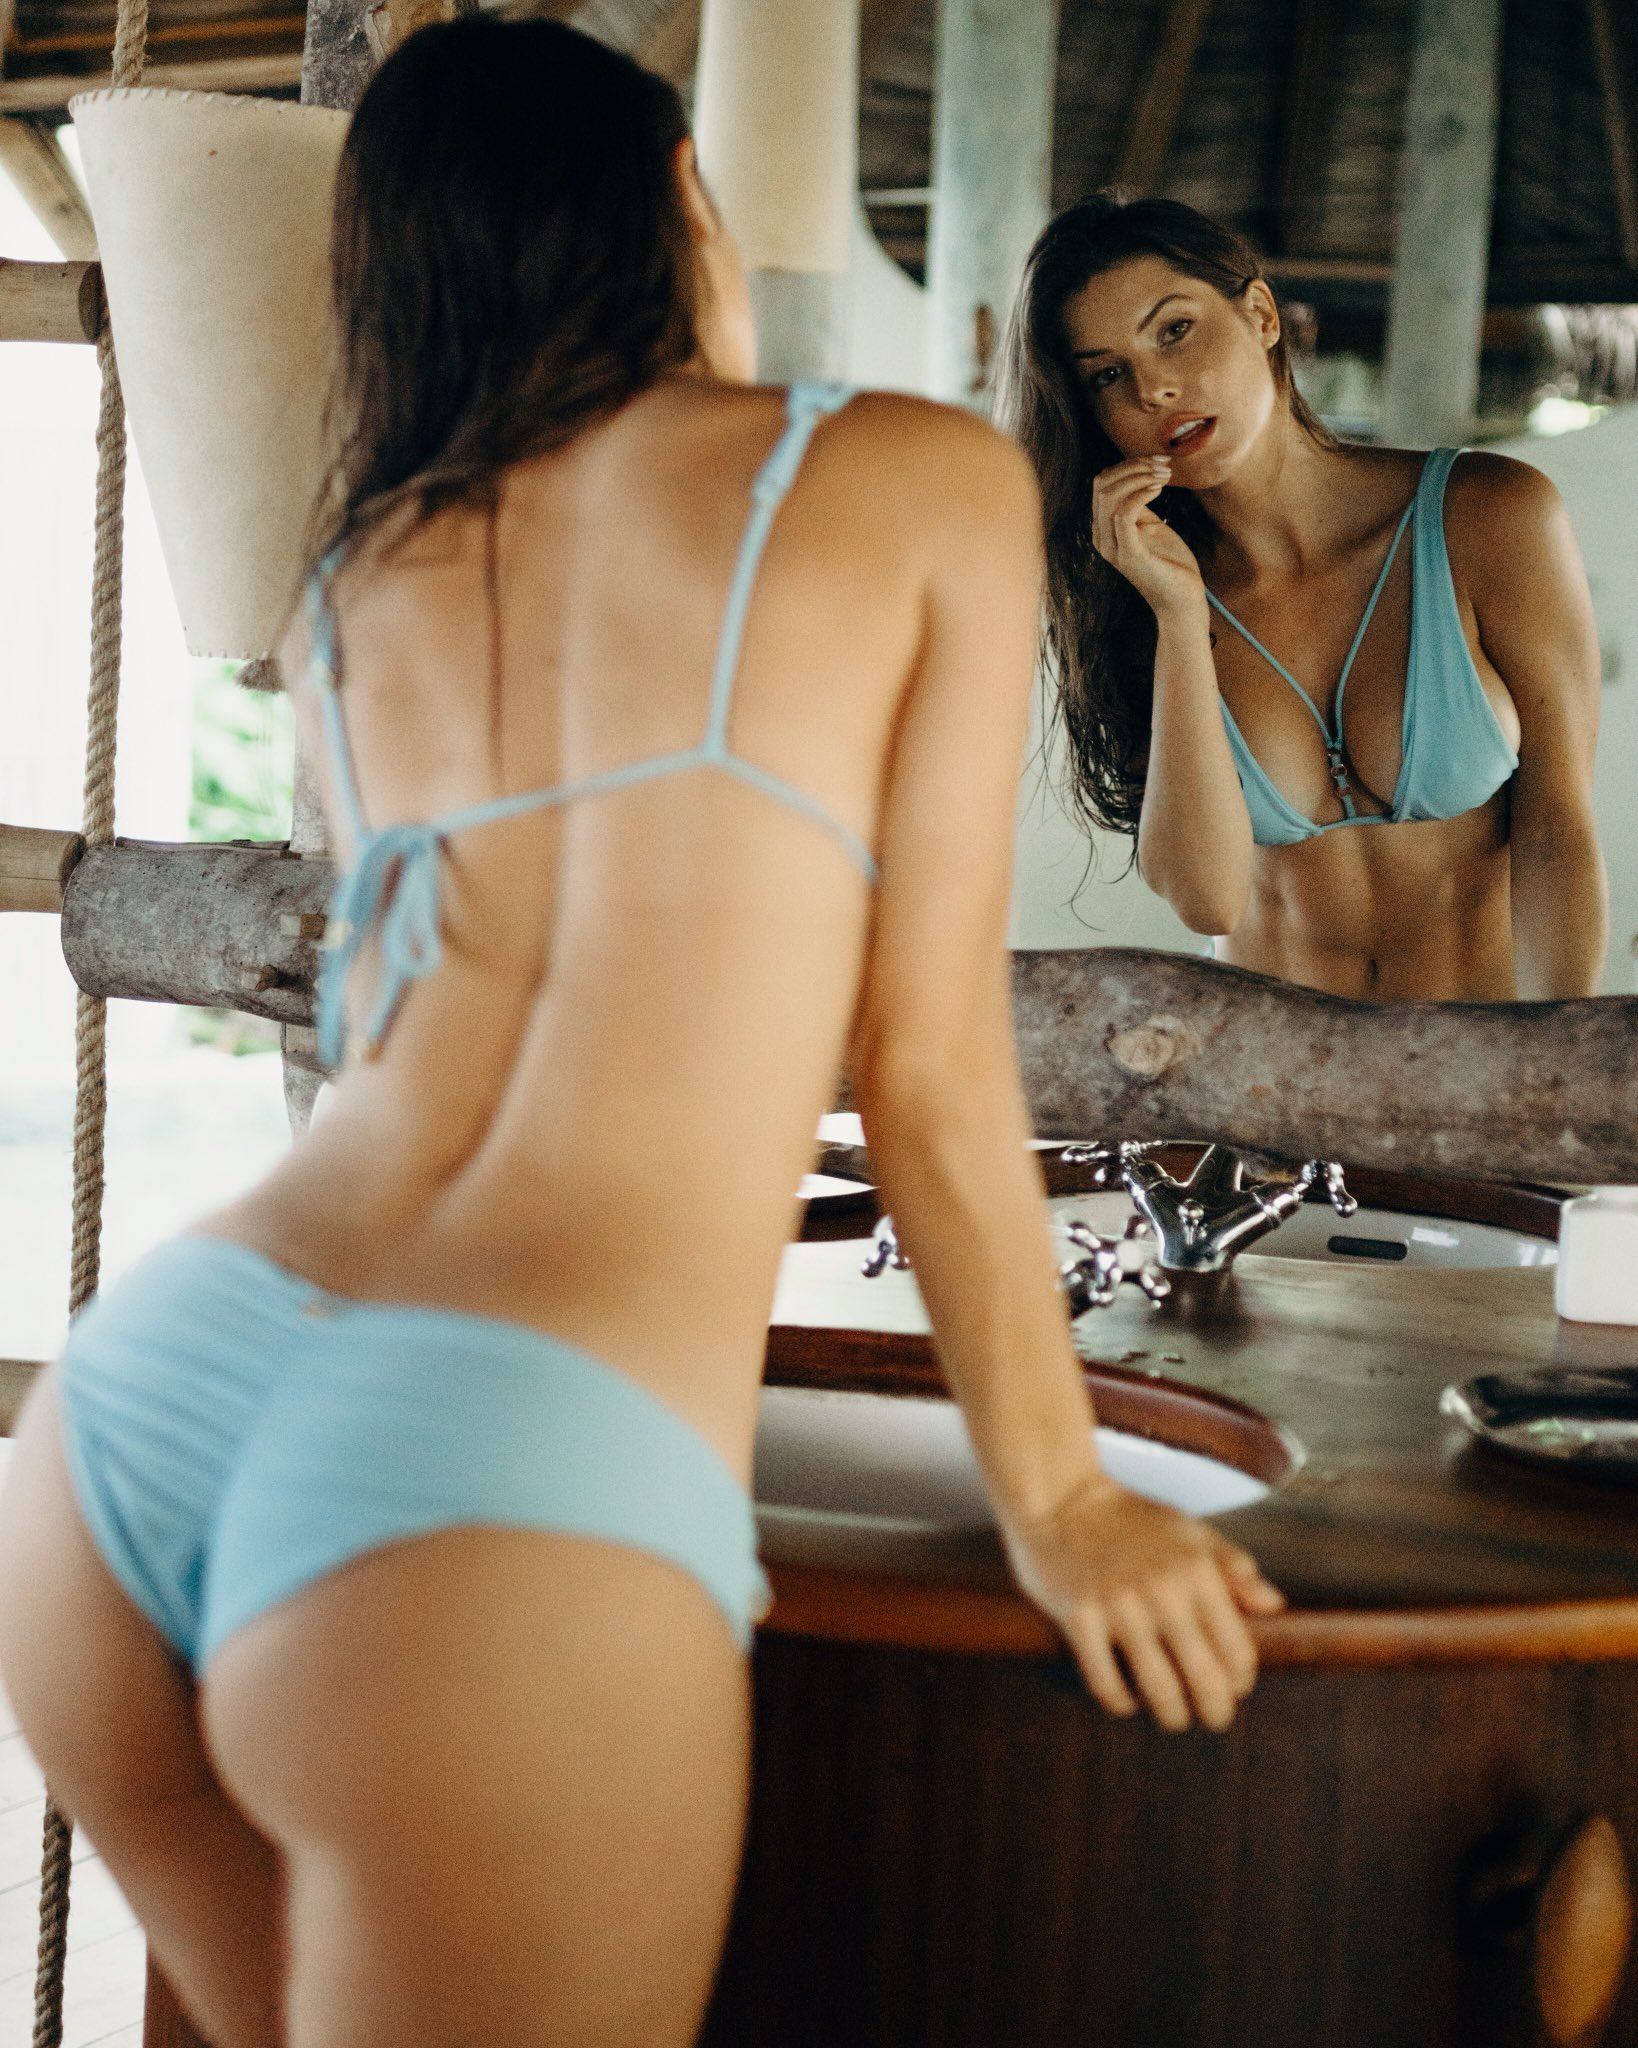 Amanda Cerny Video Porn amanda cerny porn pic - eporner